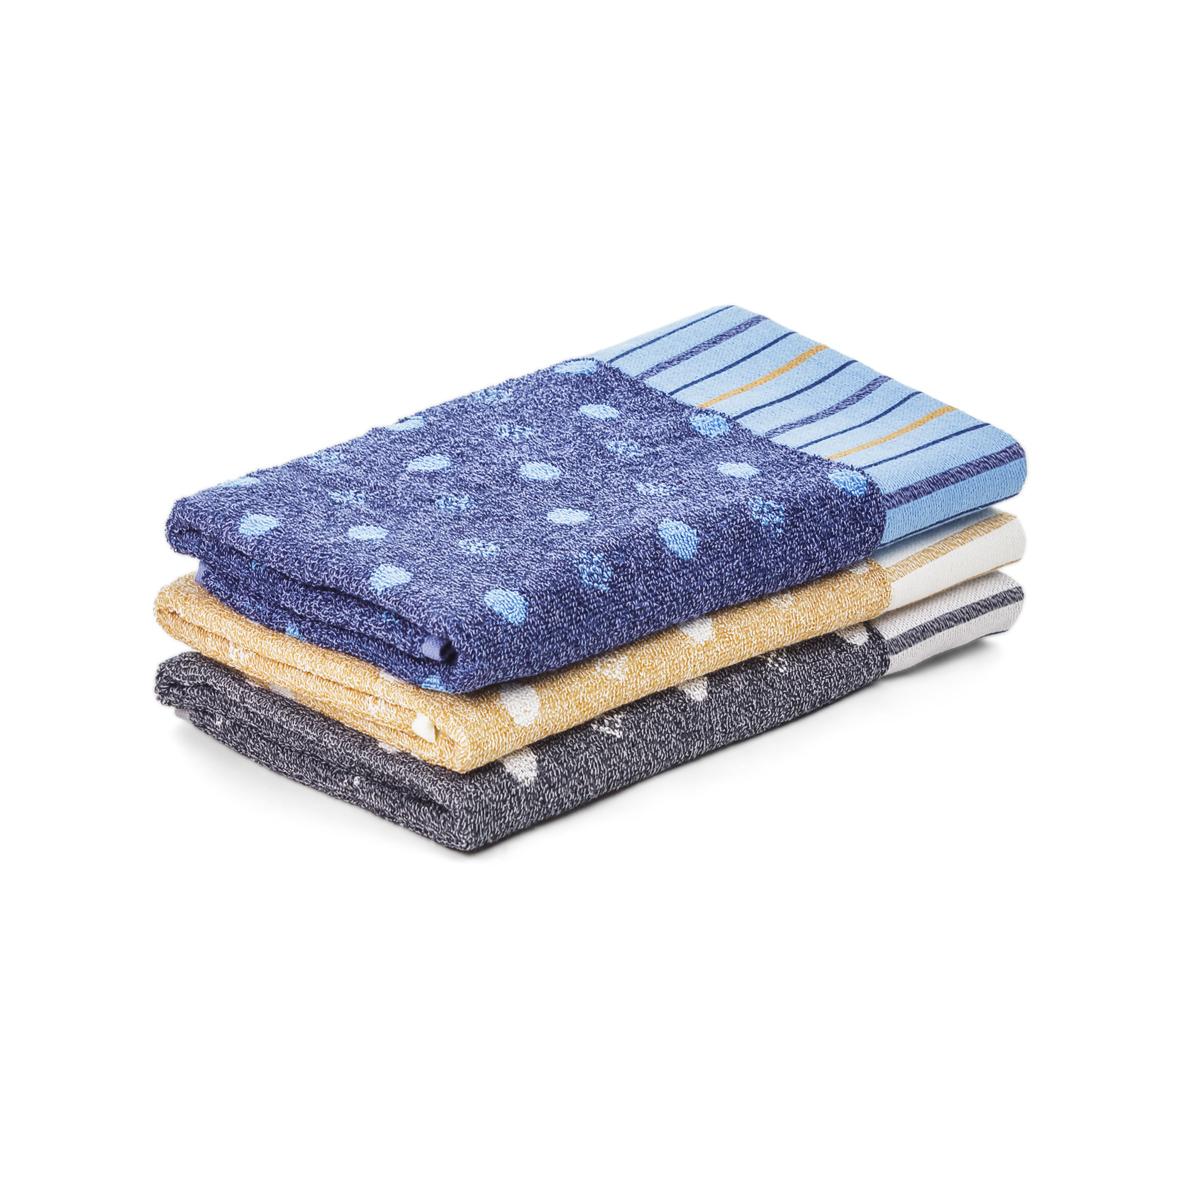 Полотенце Горошек Серый р. 65х135Махровые полотенца<br><br><br>Тип: Полотенце<br>Размер: 65х135<br>Материал: Махра